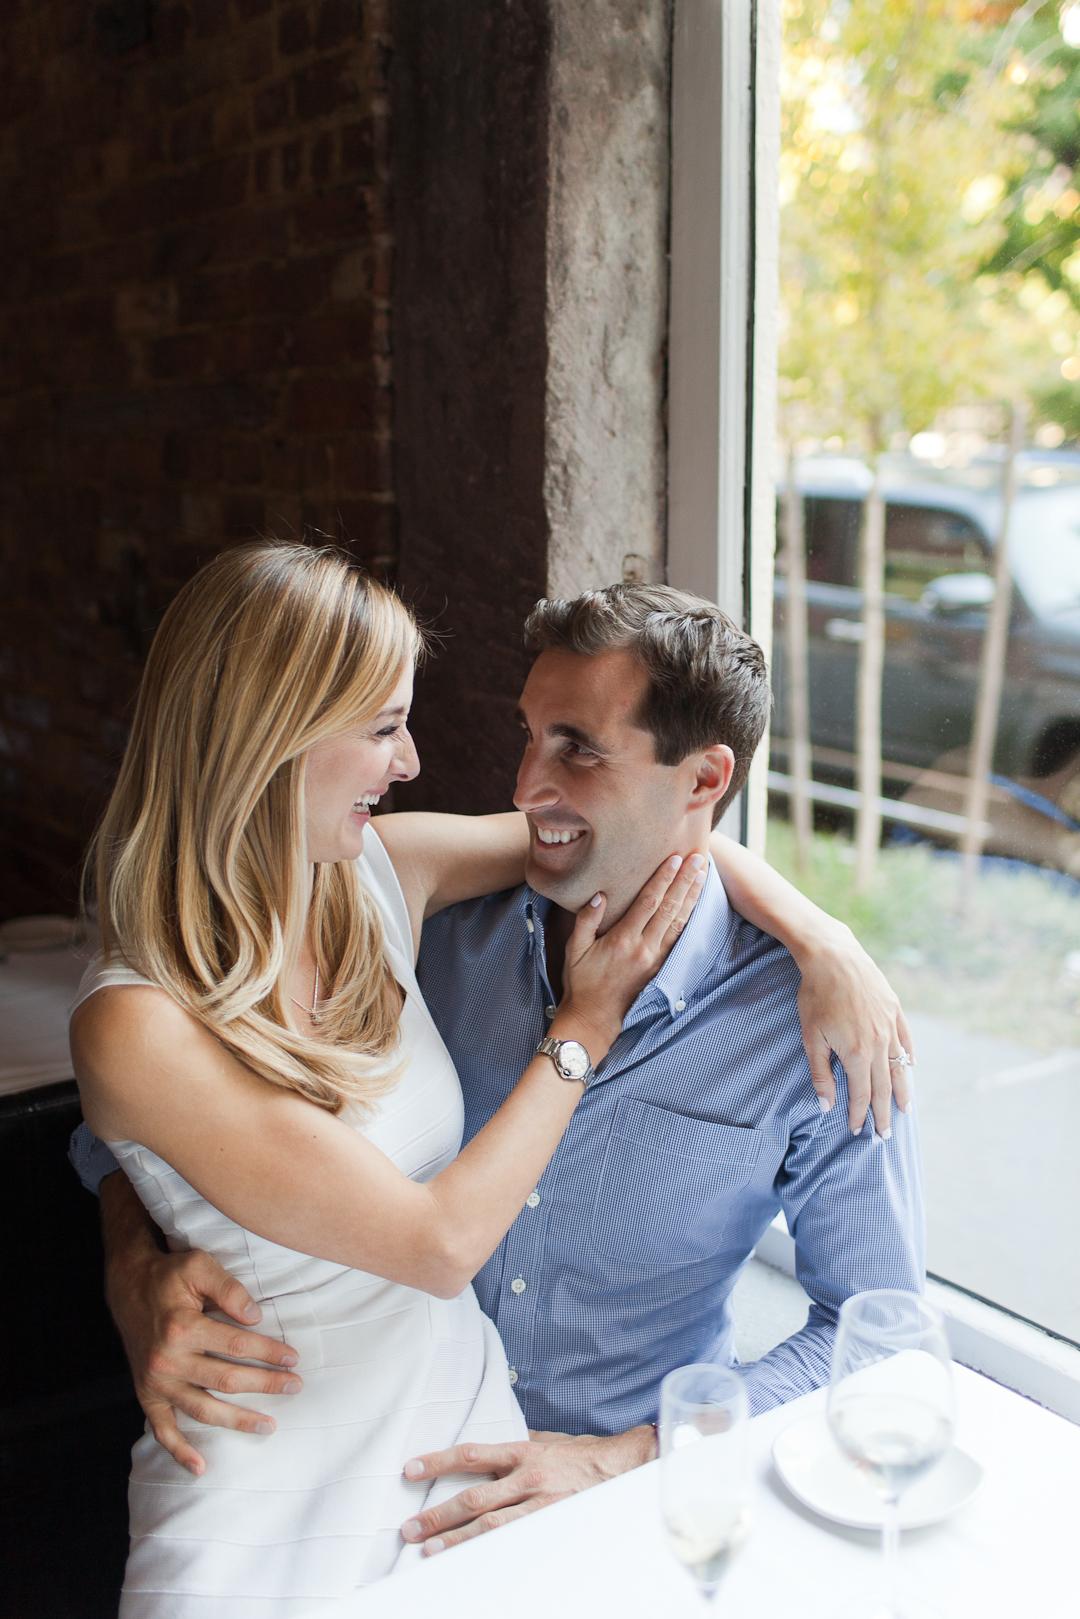 Melissa Kruse Photography - Daniece & Chris West Village Engagement Photos-17.jpg